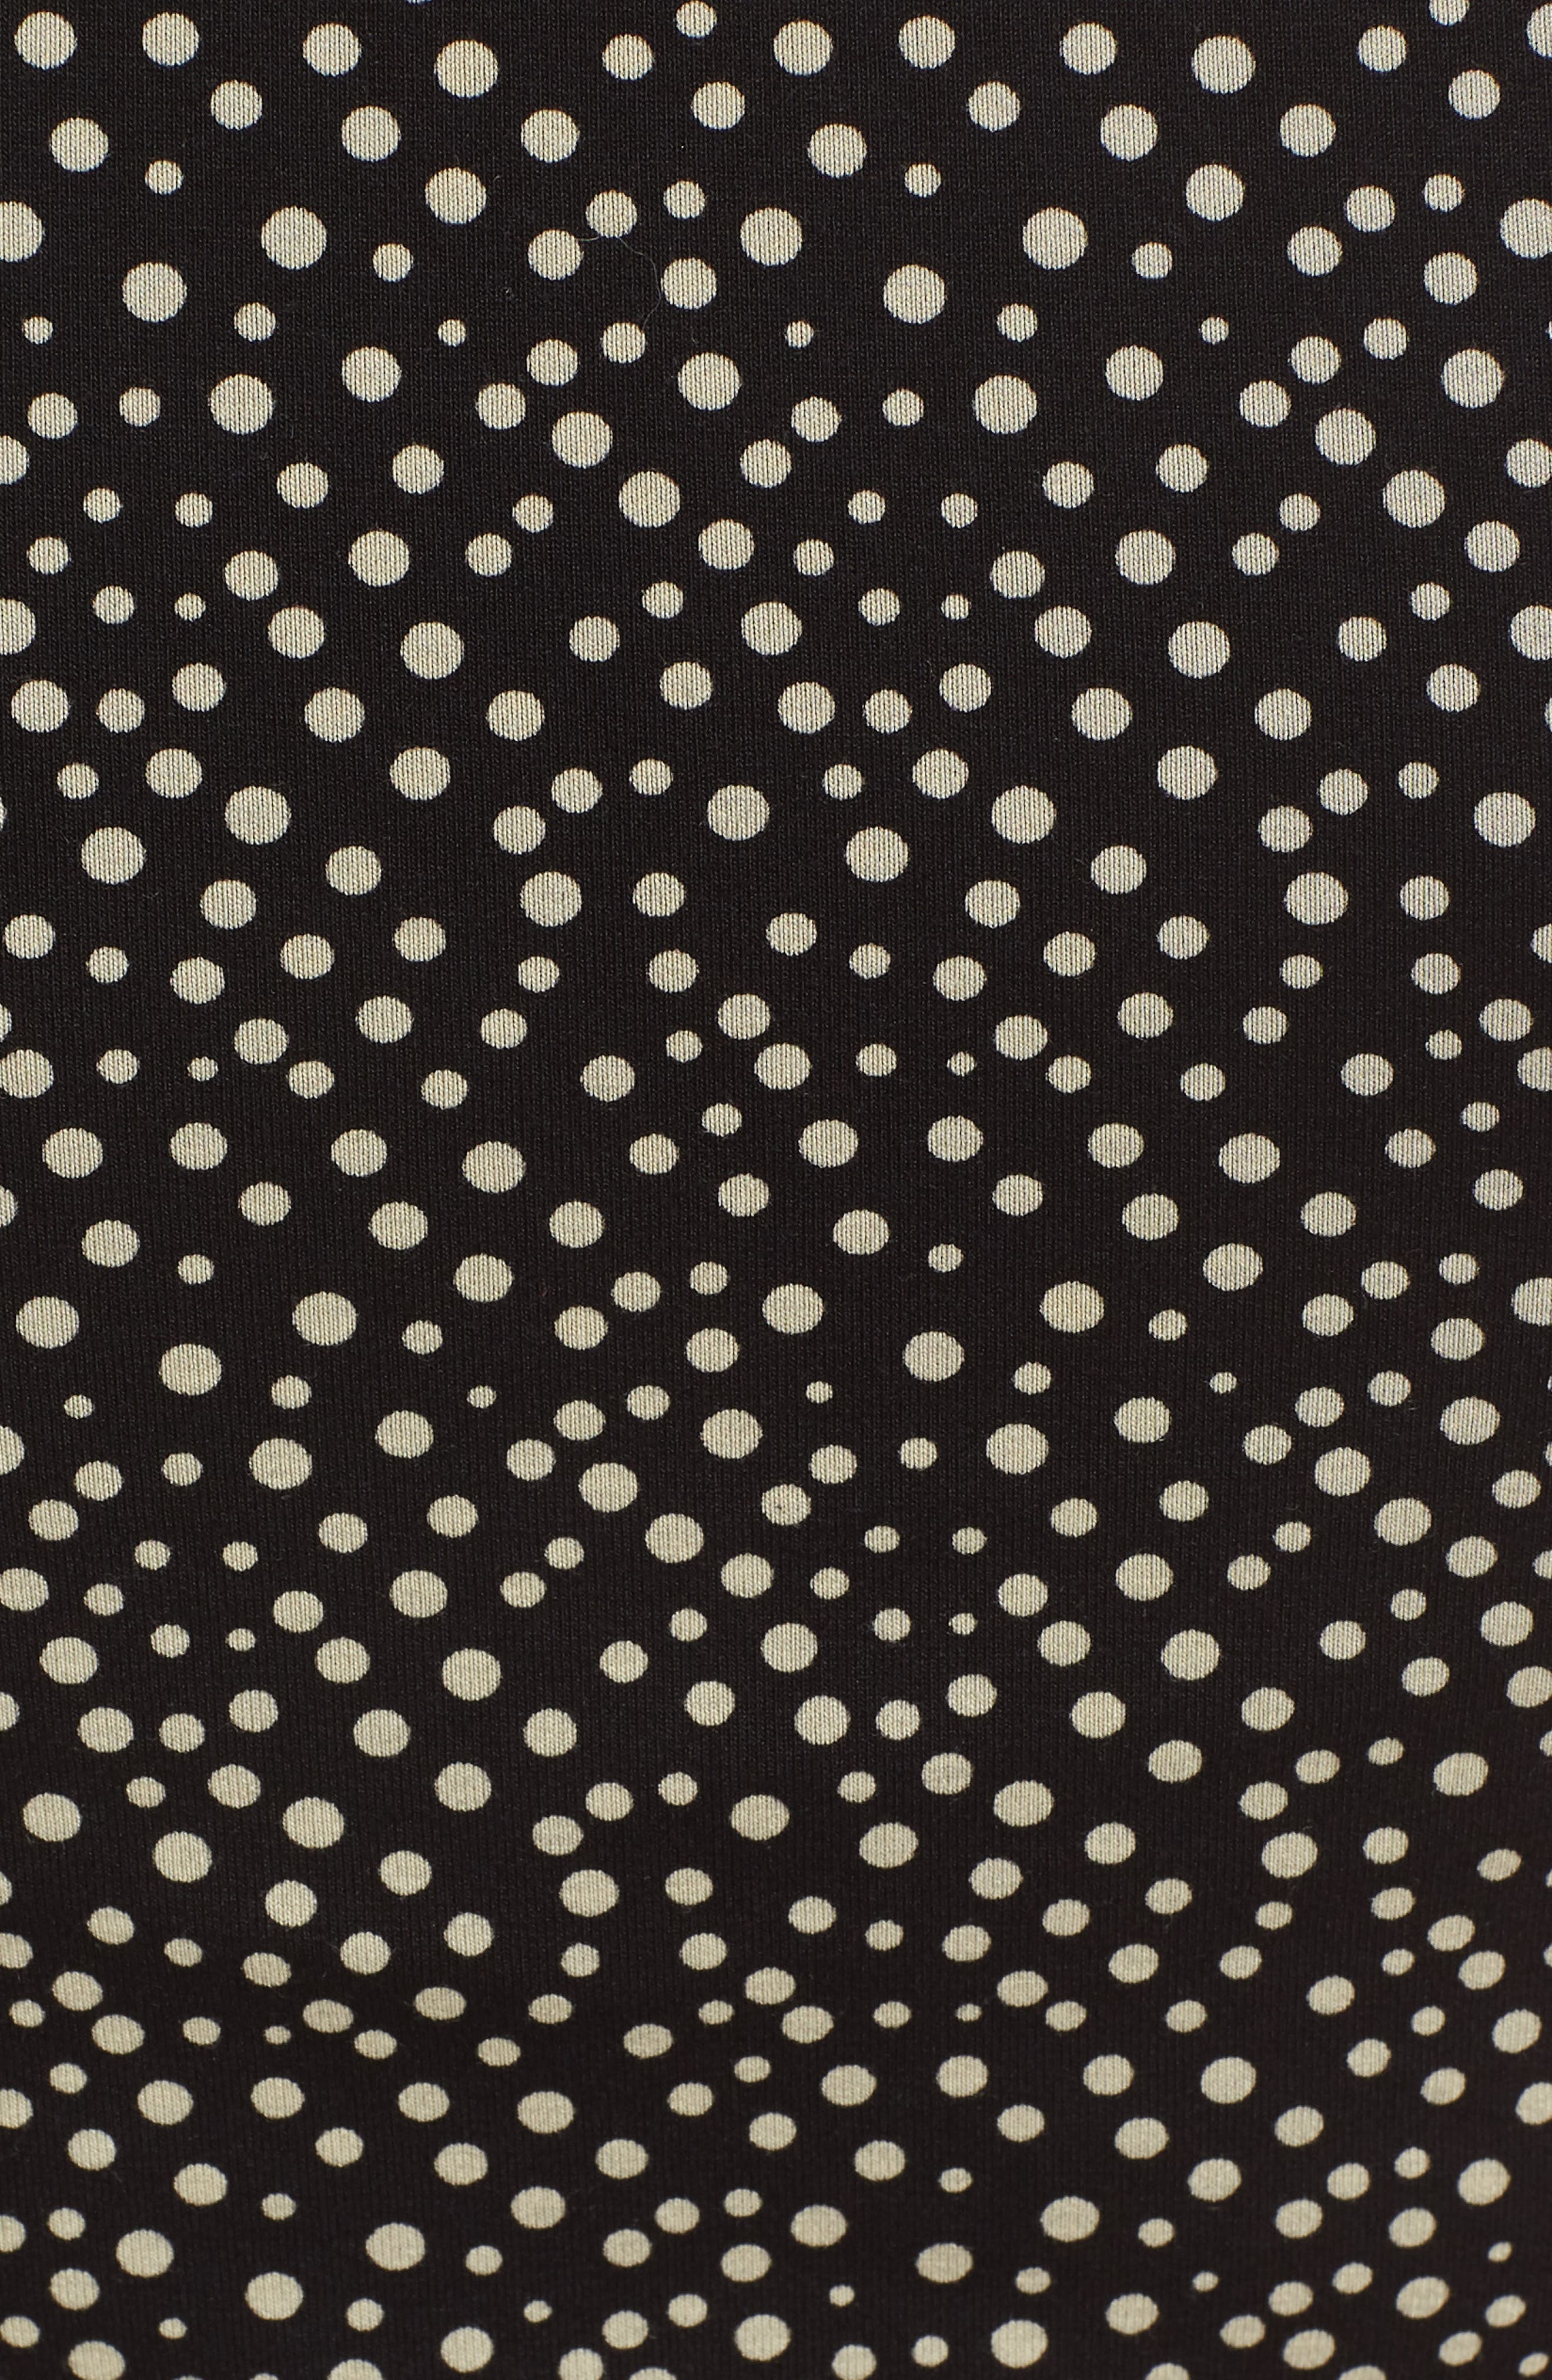 Danni Ruched Maternity Dress,                             Alternate thumbnail 5, color,                             Polka Print